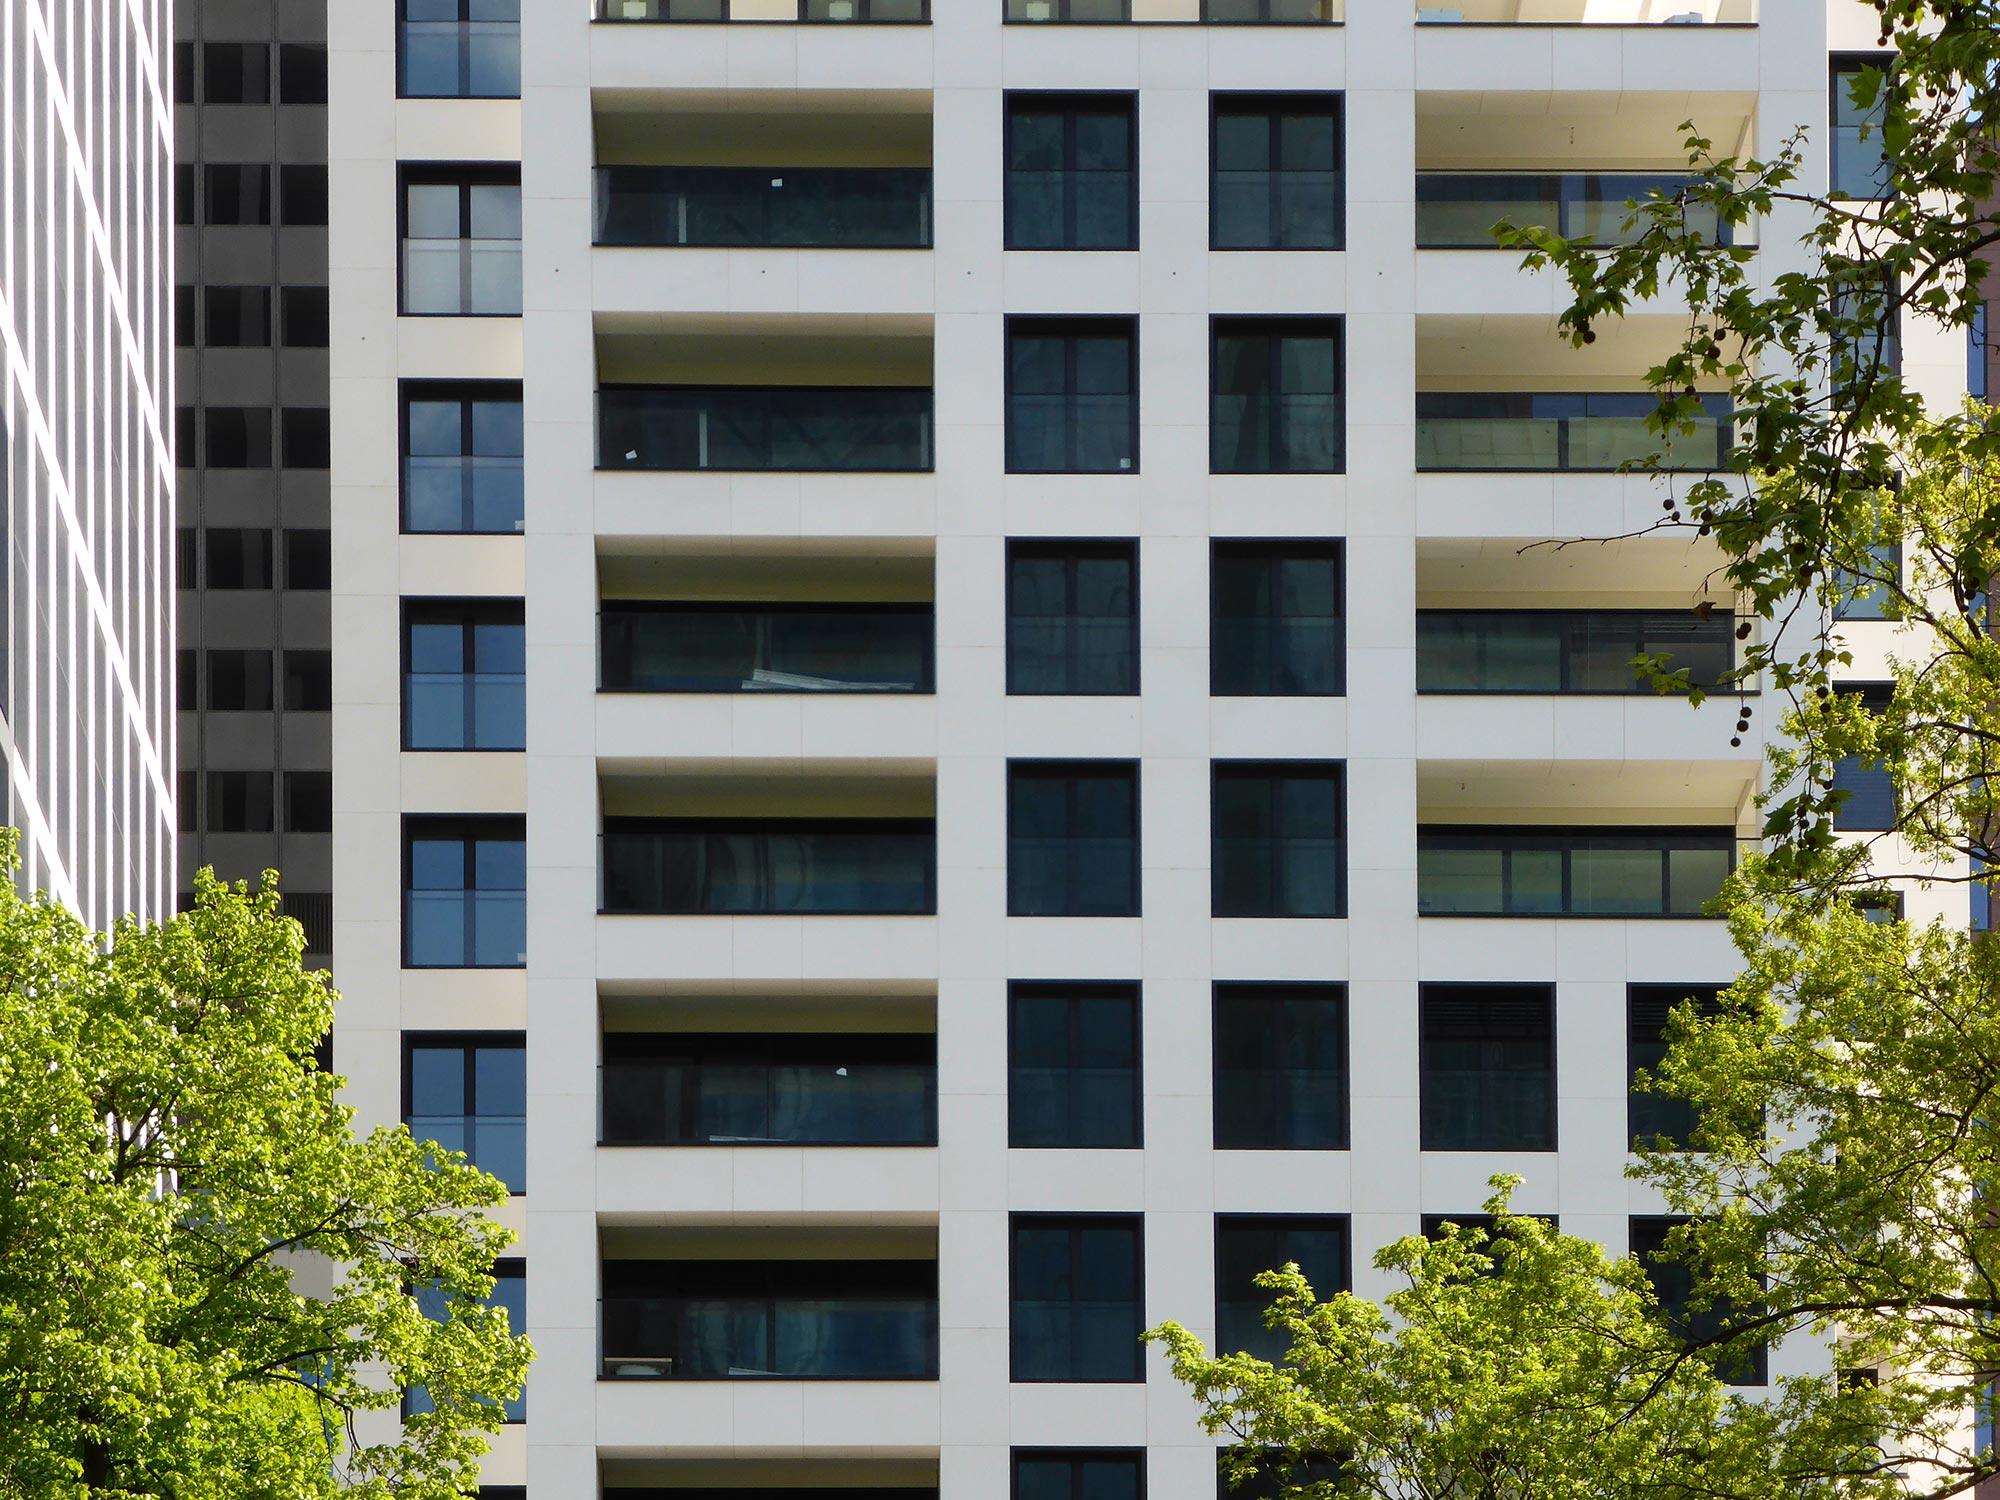 Hochhausfassade Taunus Tower Residential - Frankfurt Fassade - Natursteinfassade